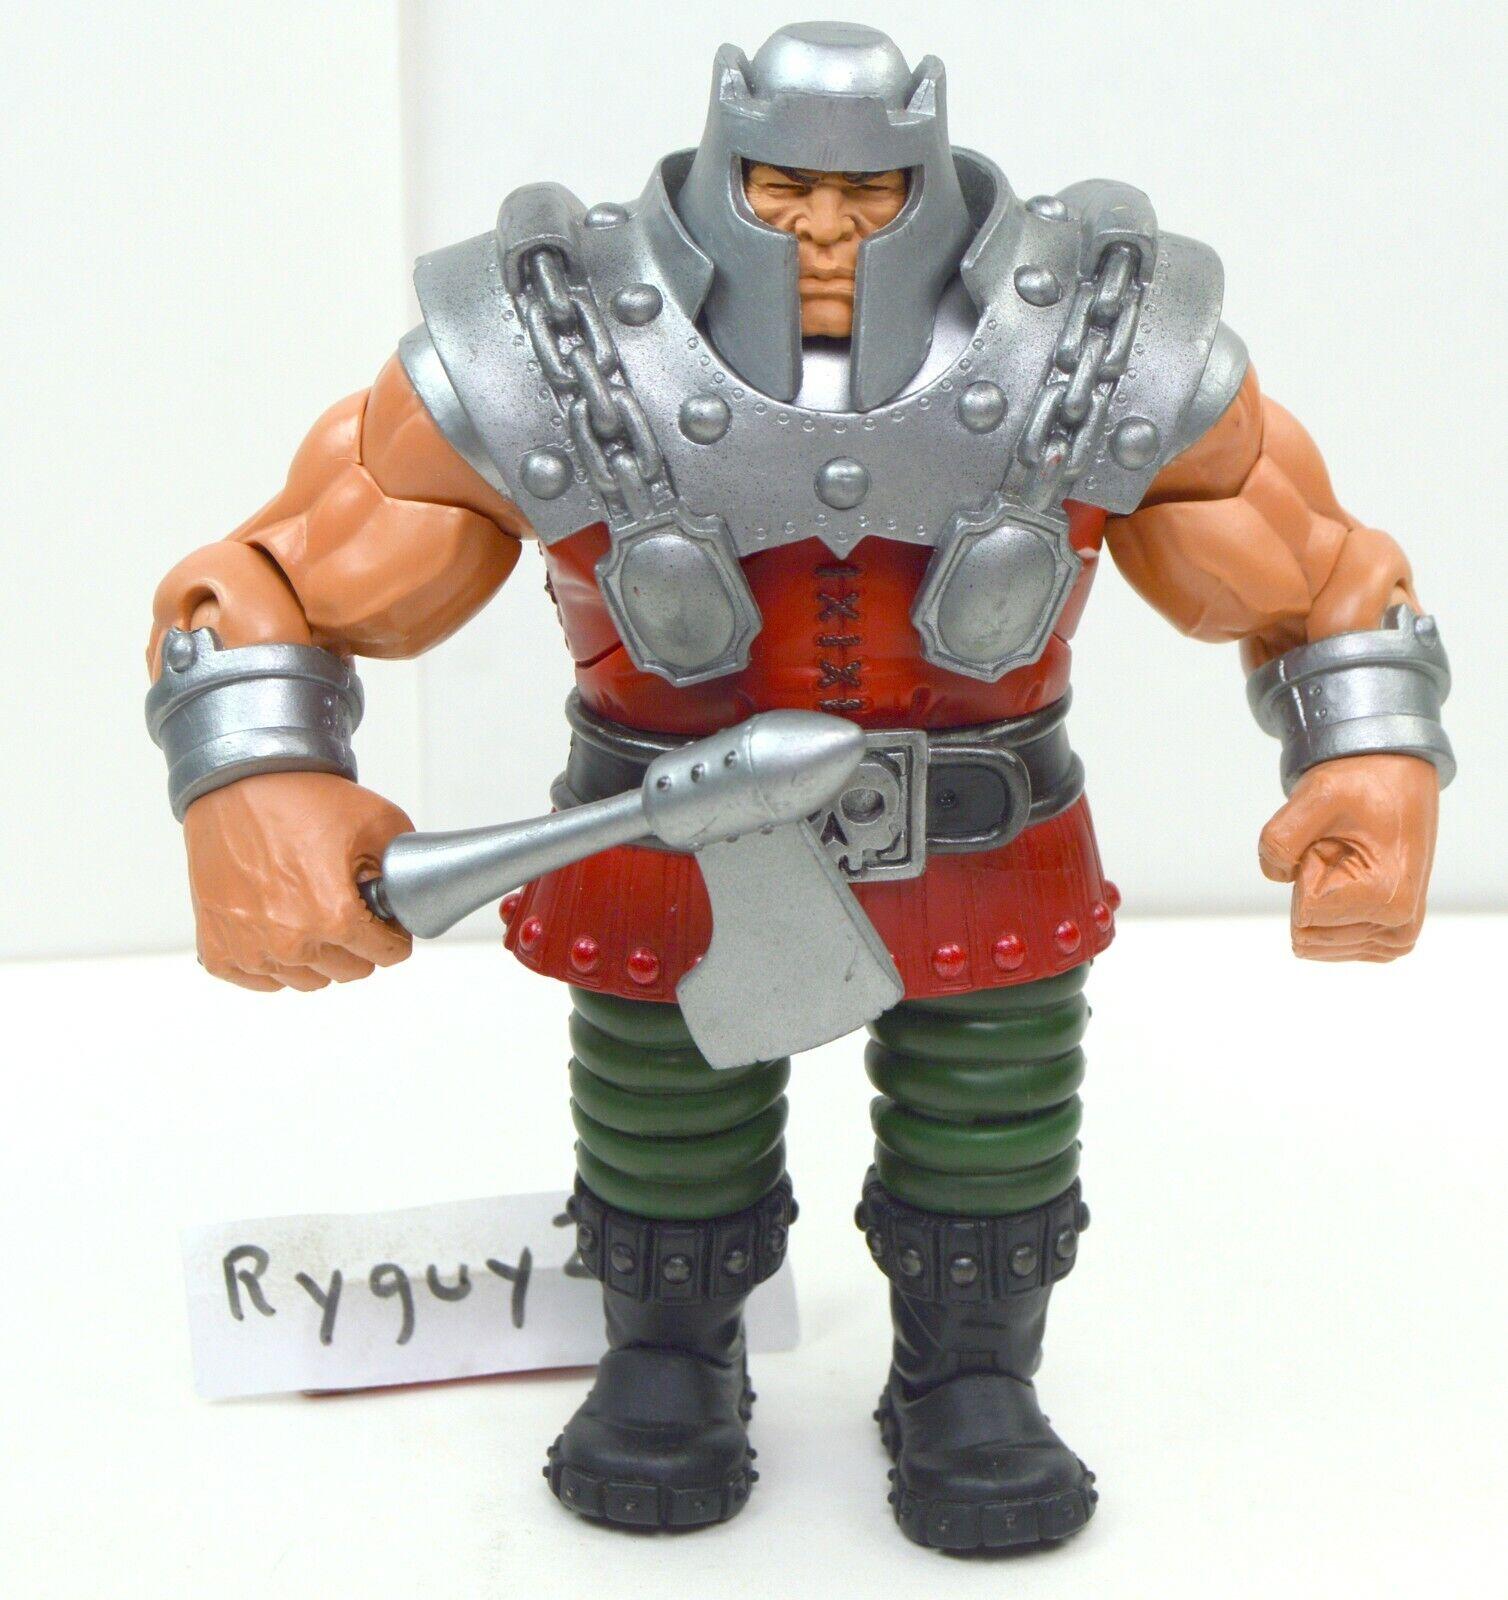 MOTUC, Ram Man, figure, Masters of the Universe Classics, He-Man, parts, Ax